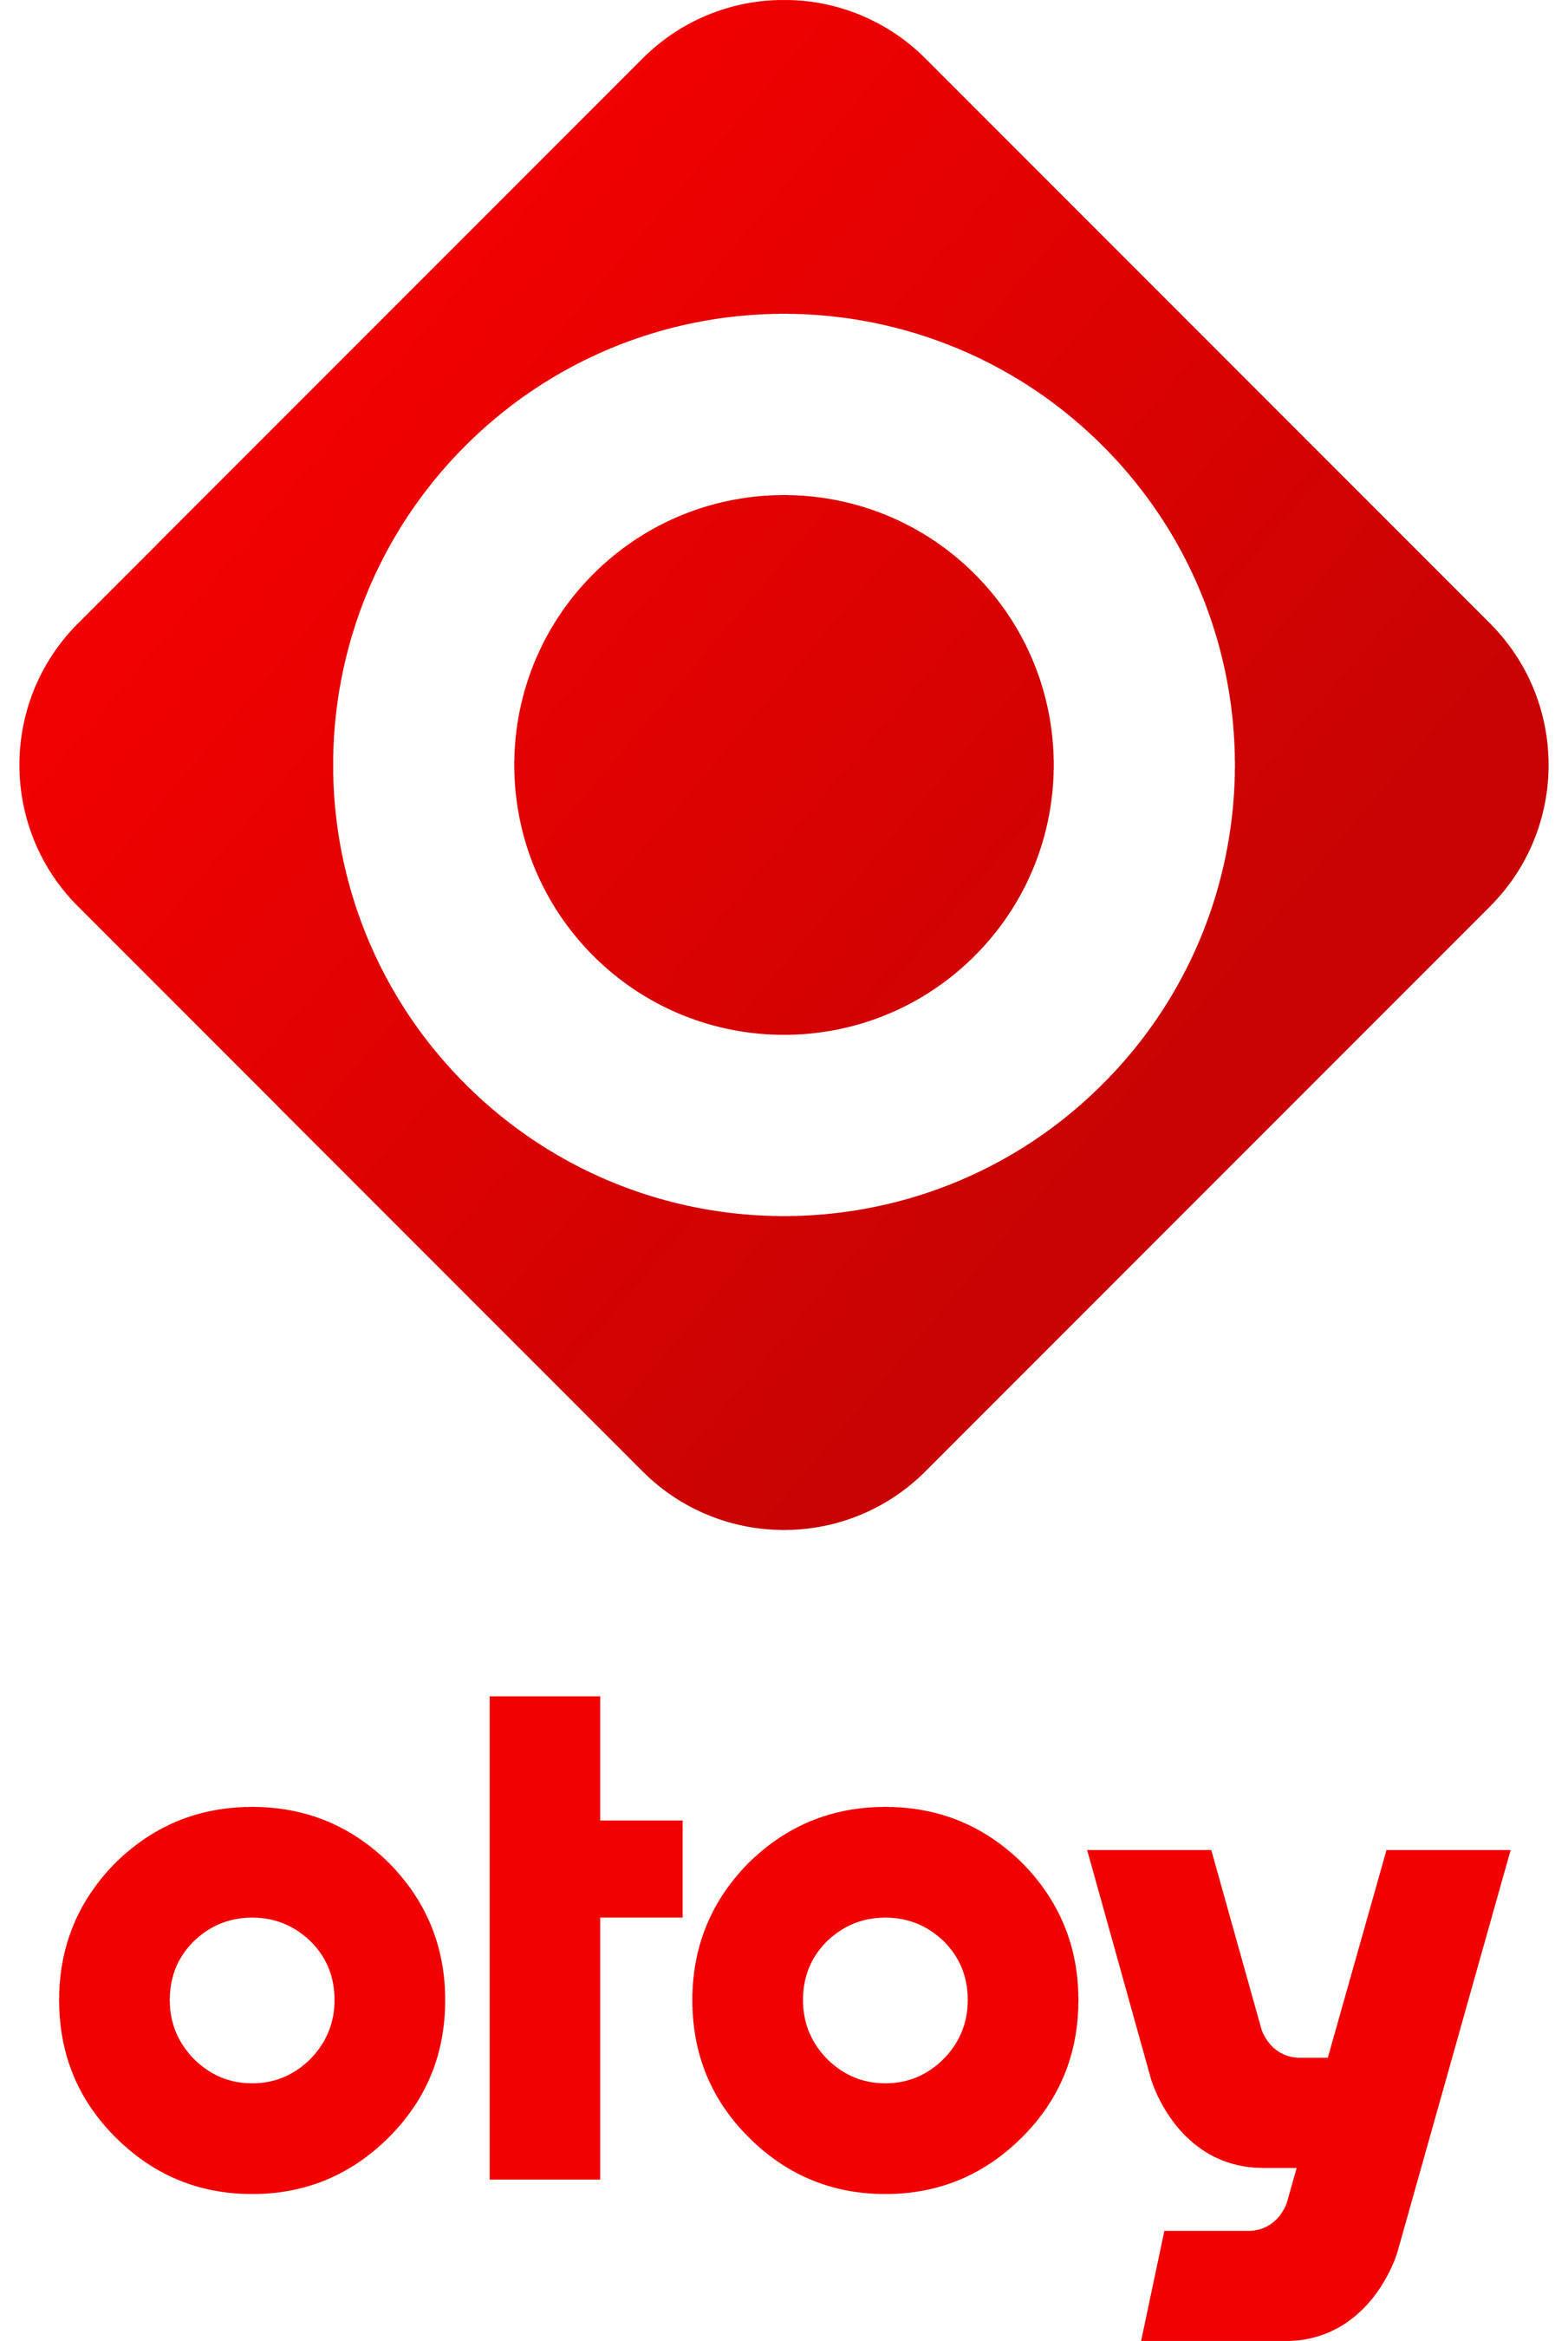 OTOY, Inc. (PRNewsFoto/OTOY Inc.) (PRNewsFoto/OTOY INC_)